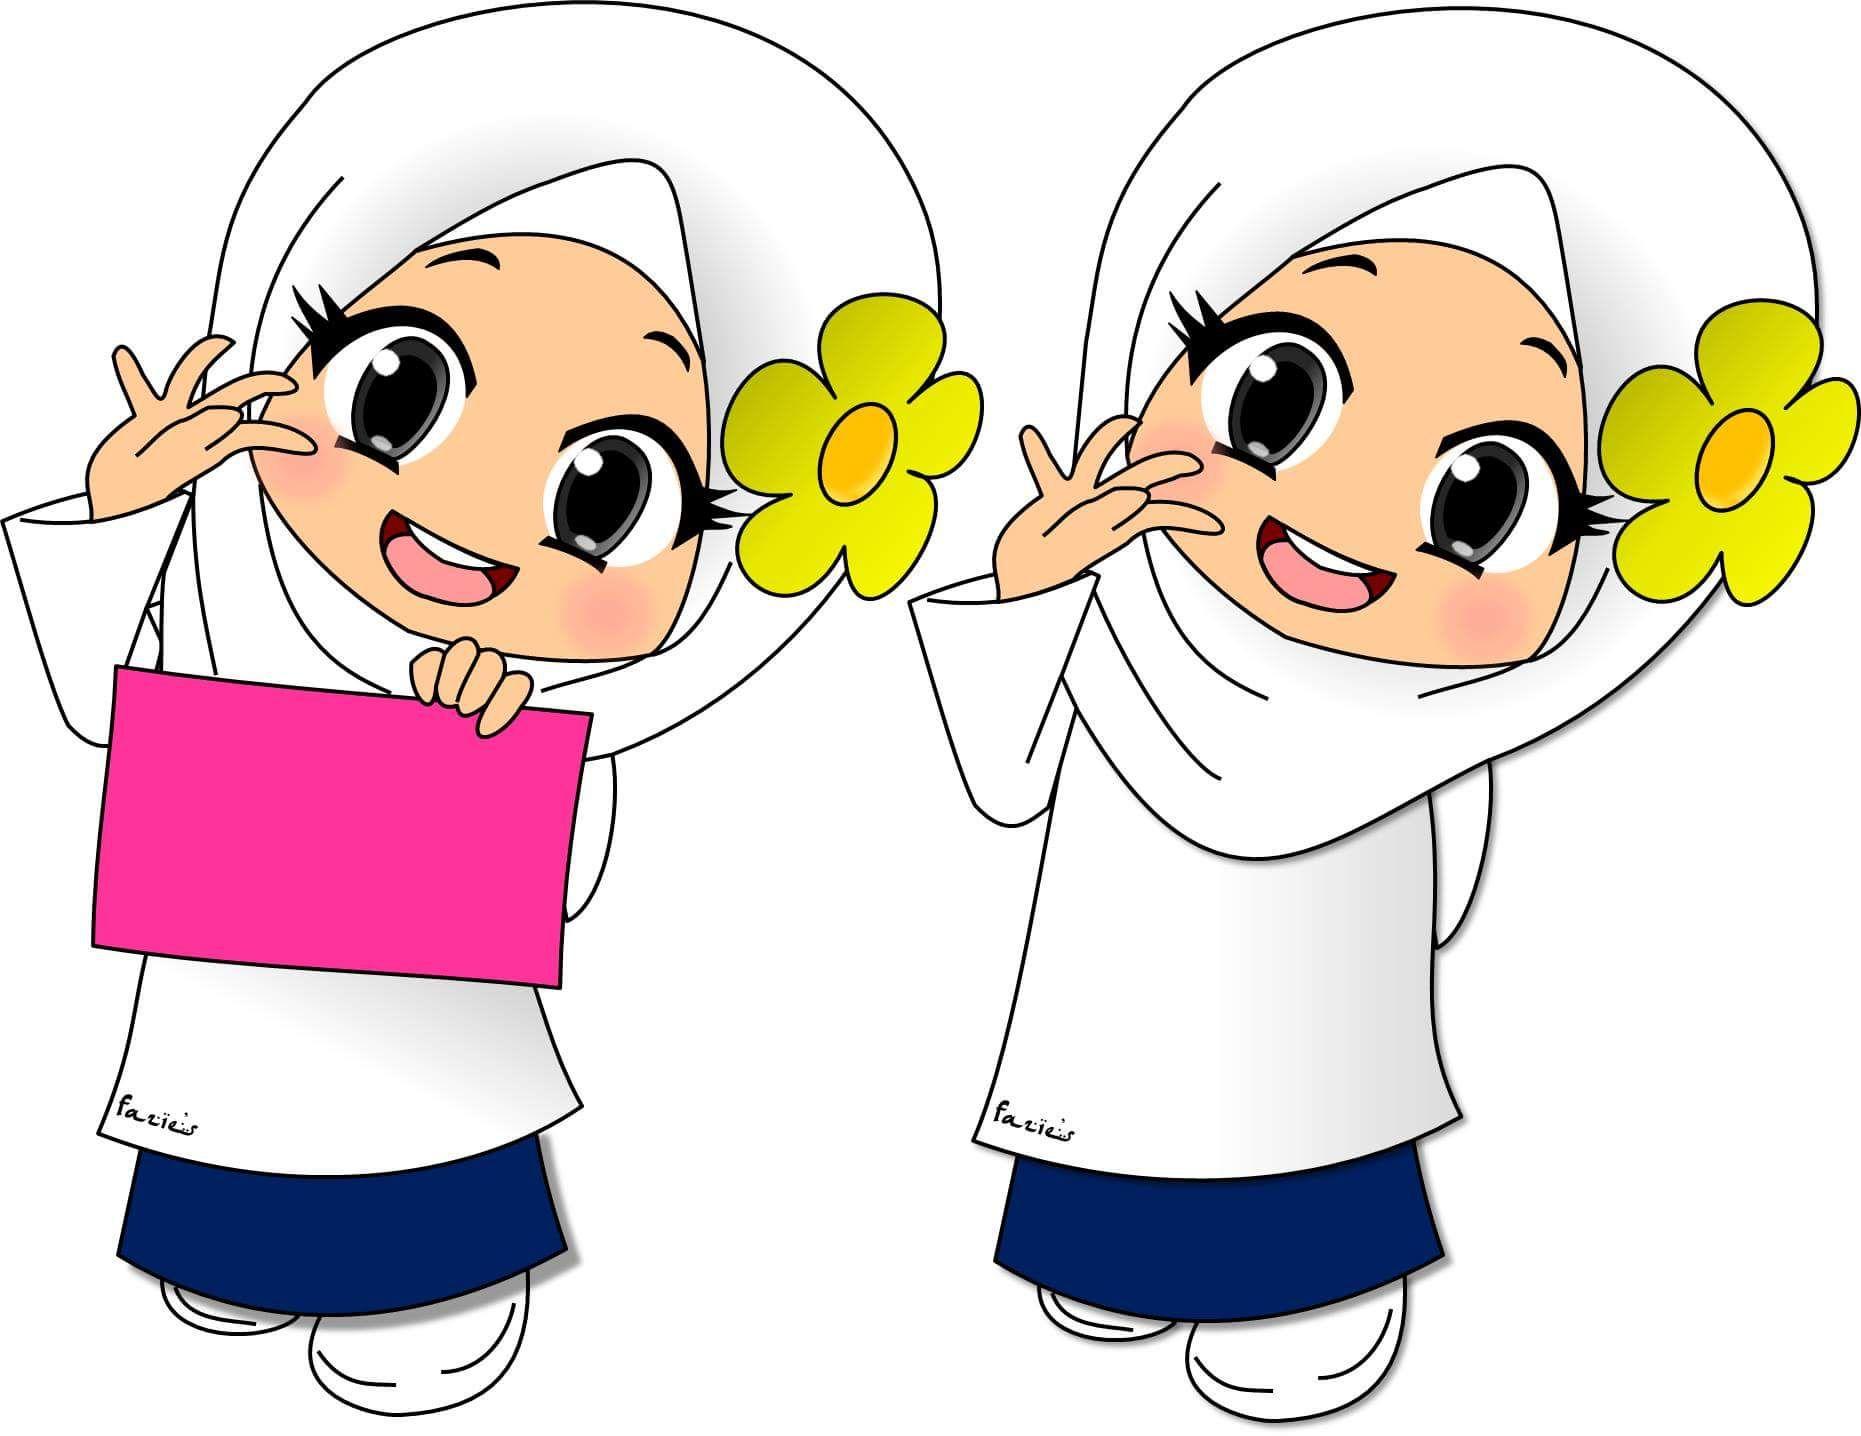 Ana Muslimah Cute Wallpaper Kartun Muslimah Penelusuran Google Campuran T